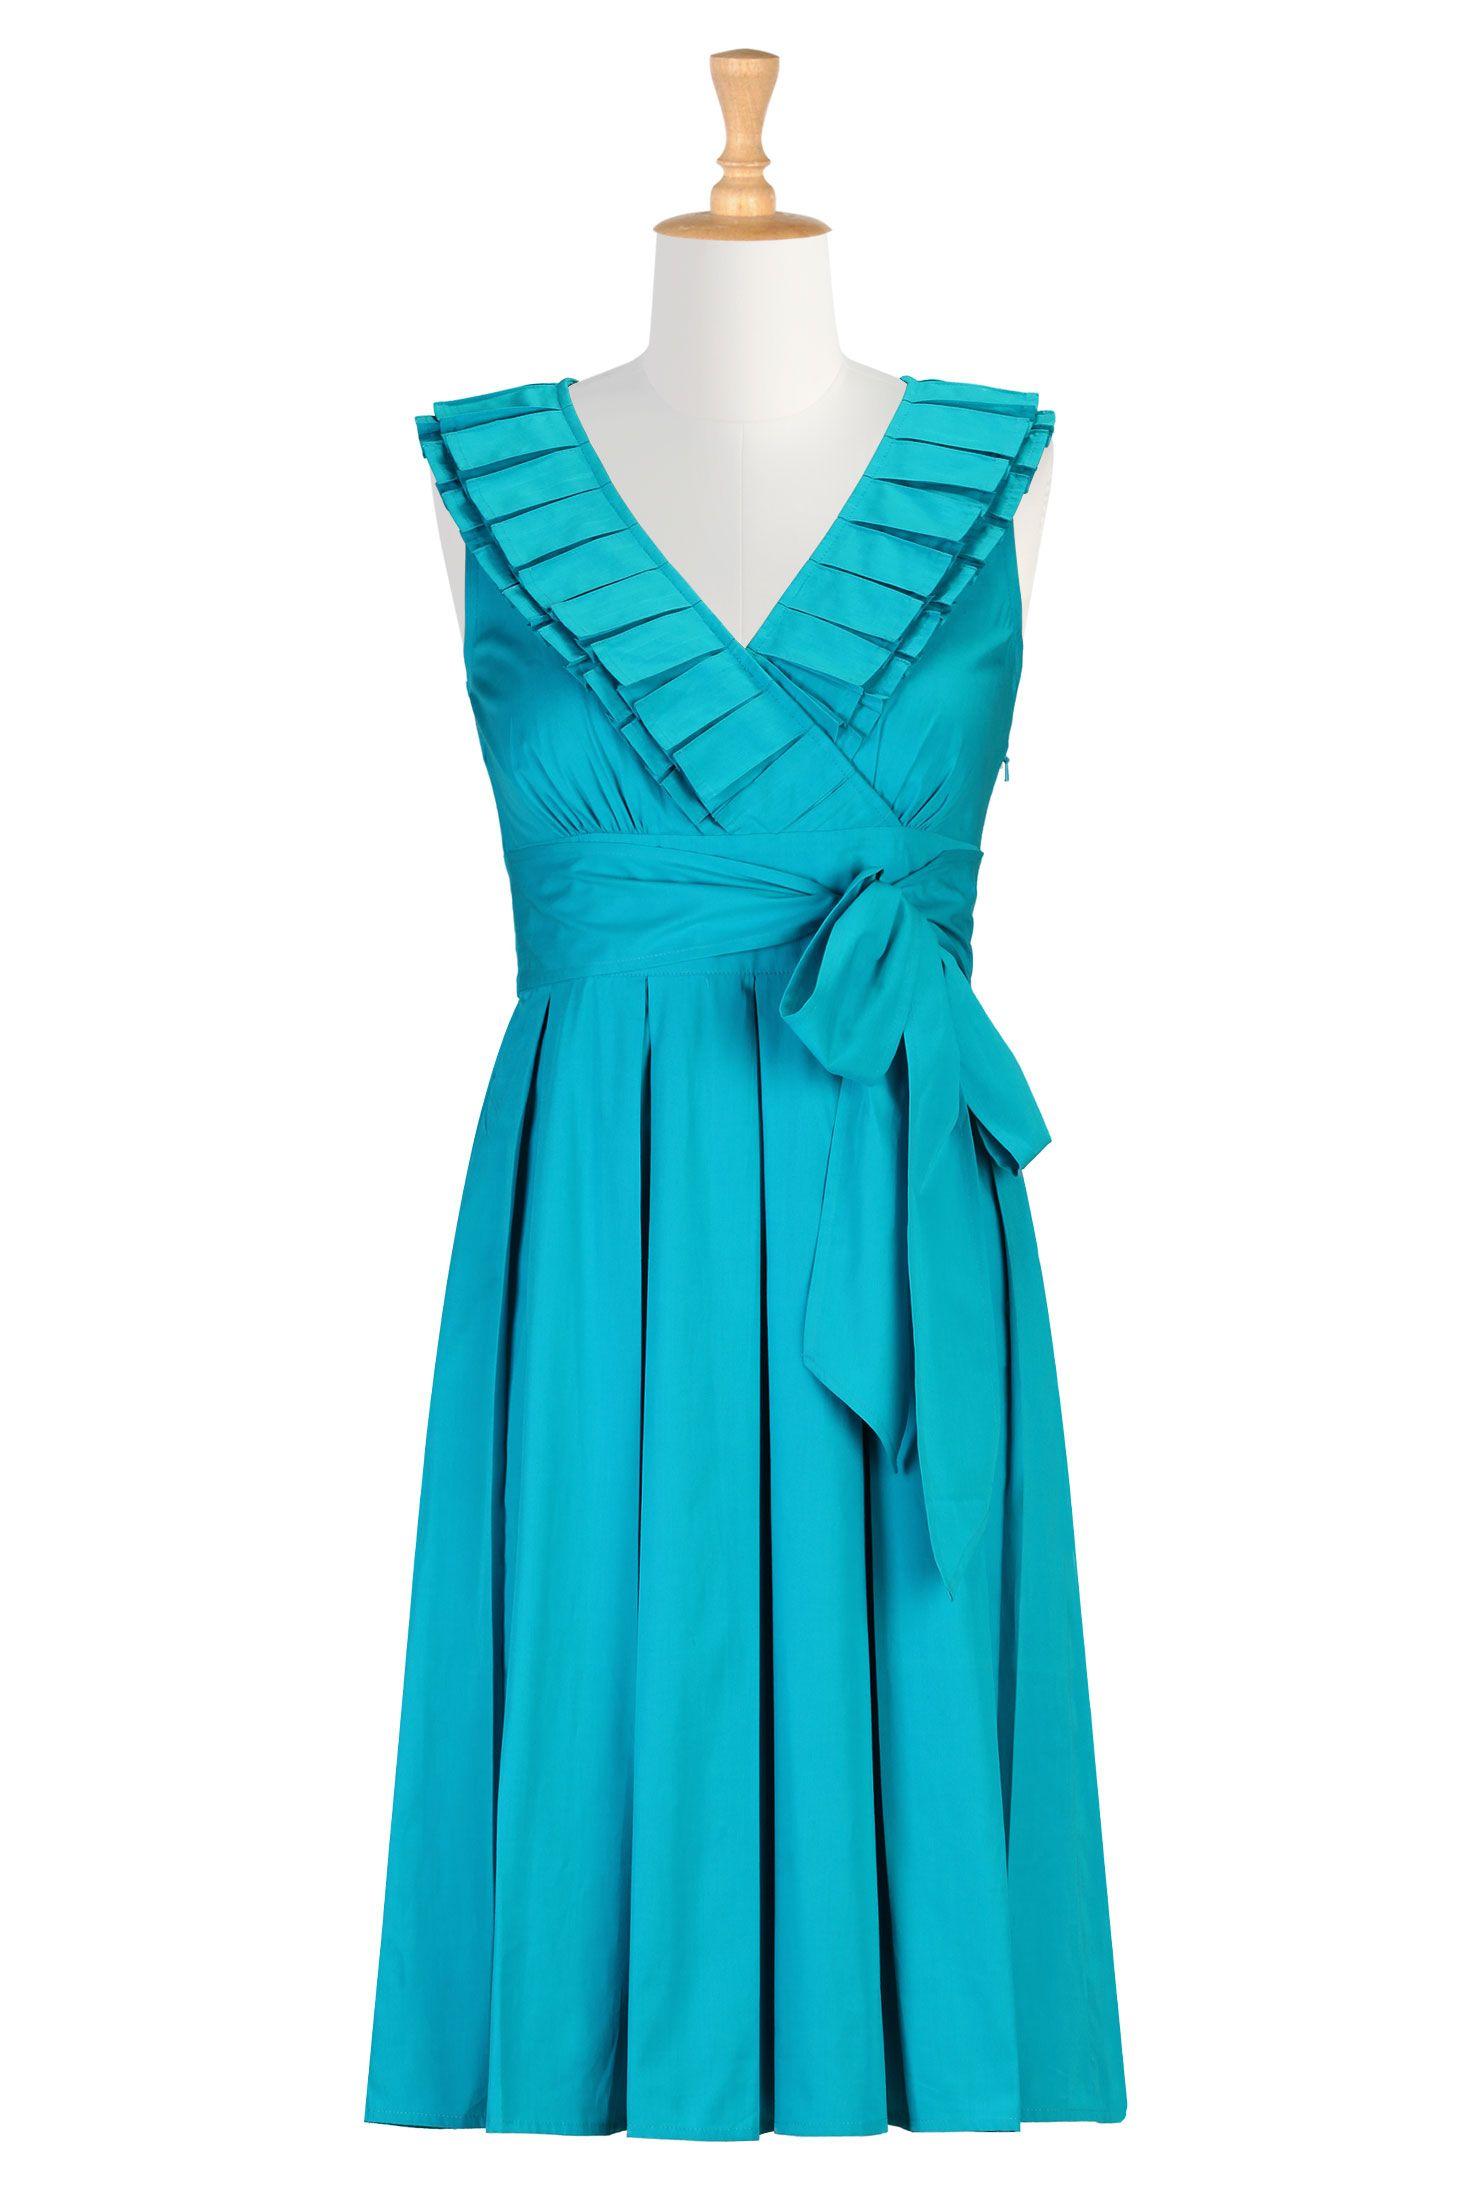 Paris dress | Clothing stores, Designer dresses and Summer dresses